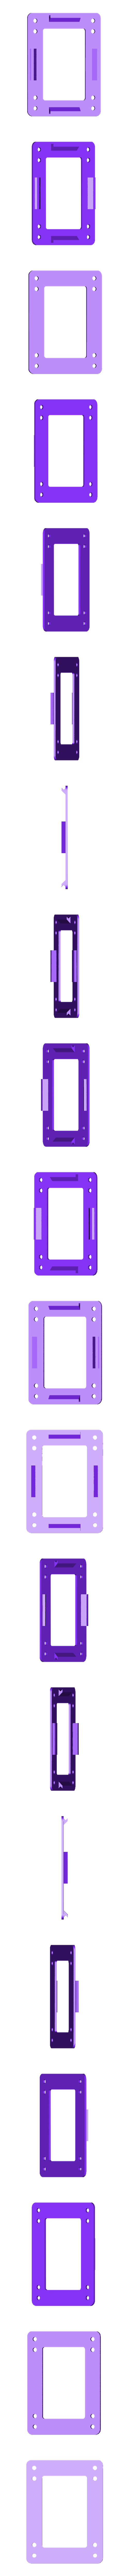 slider-featherwing-case-bottom.stl Download free STL file CircuitPython Camera Slider • 3D print design, Adafruit